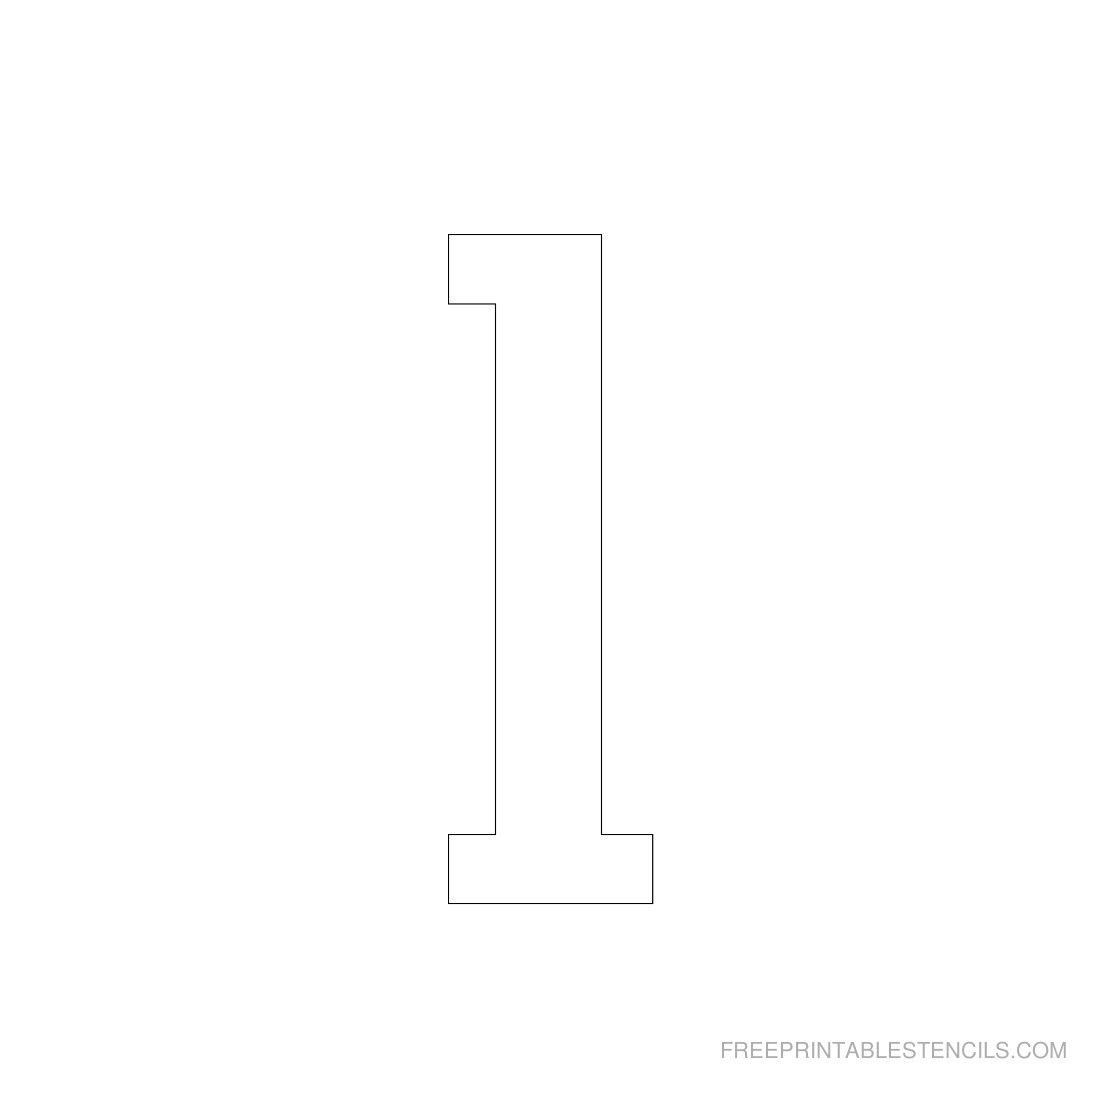 Printable 3 Inch Number Stencils 1-10   Free Printable Stencils - Free Printable 3 Inch Number Stencils